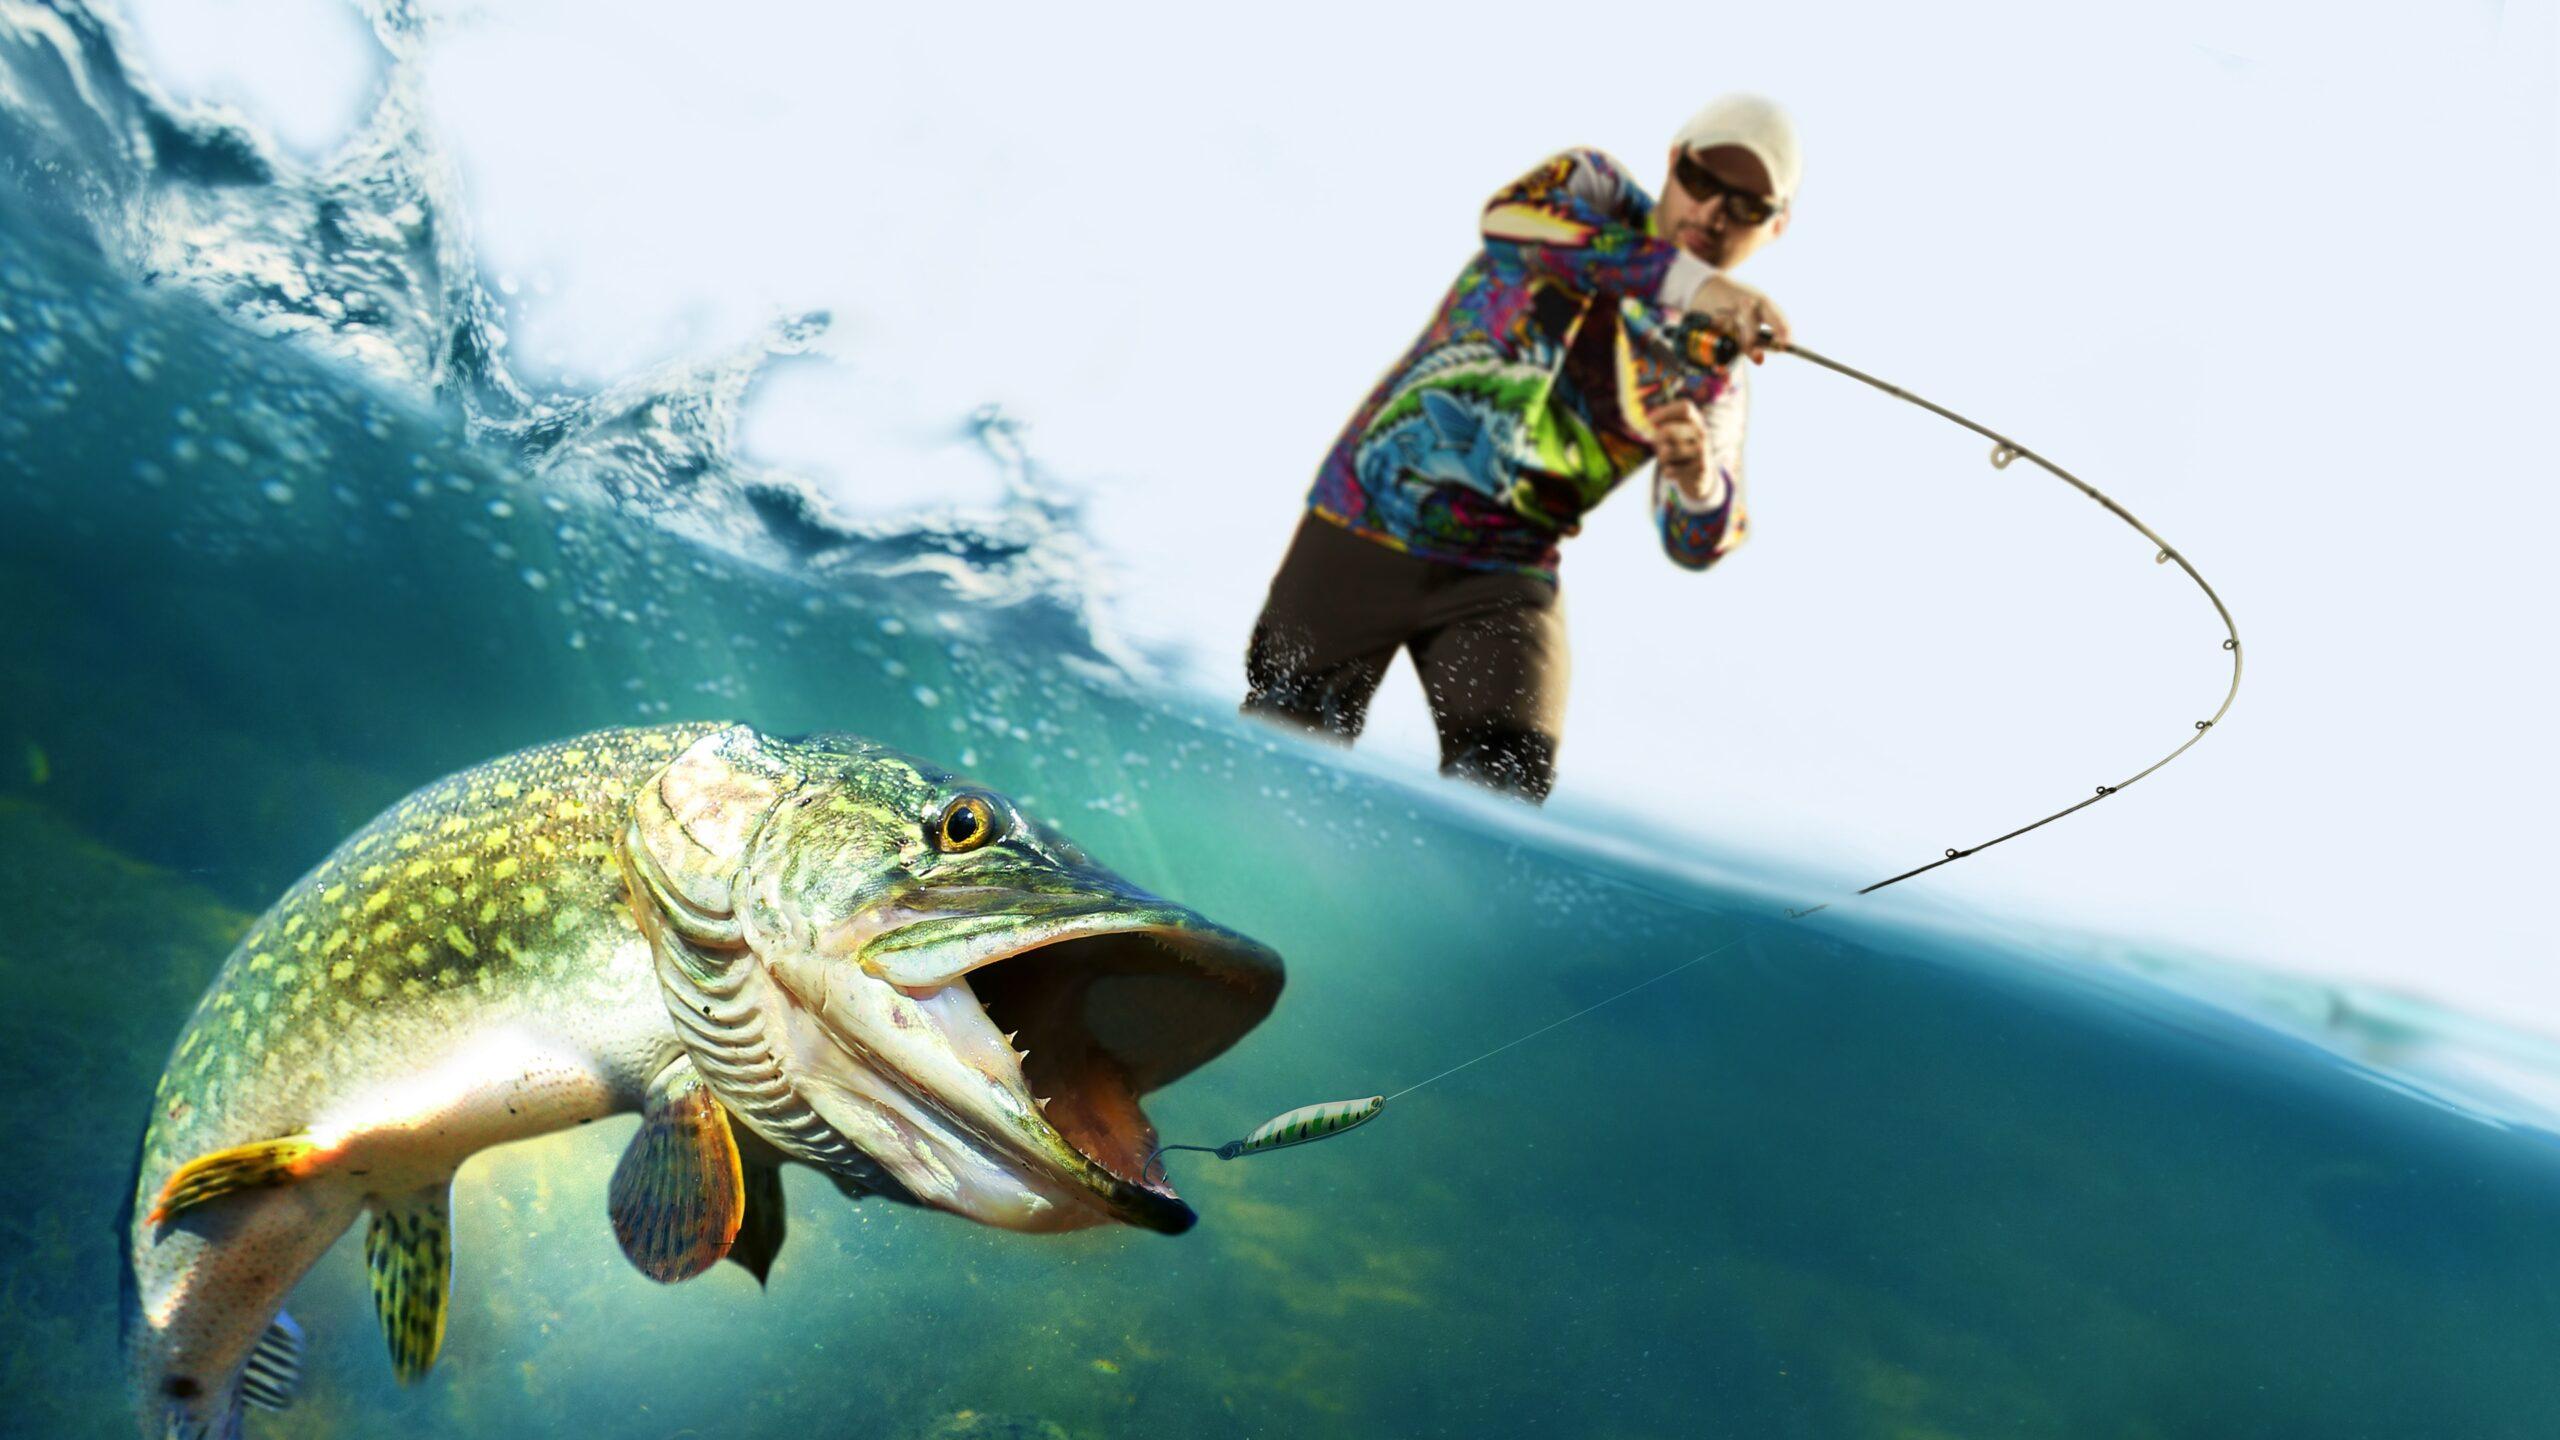 trip to fish fishing travel planner app